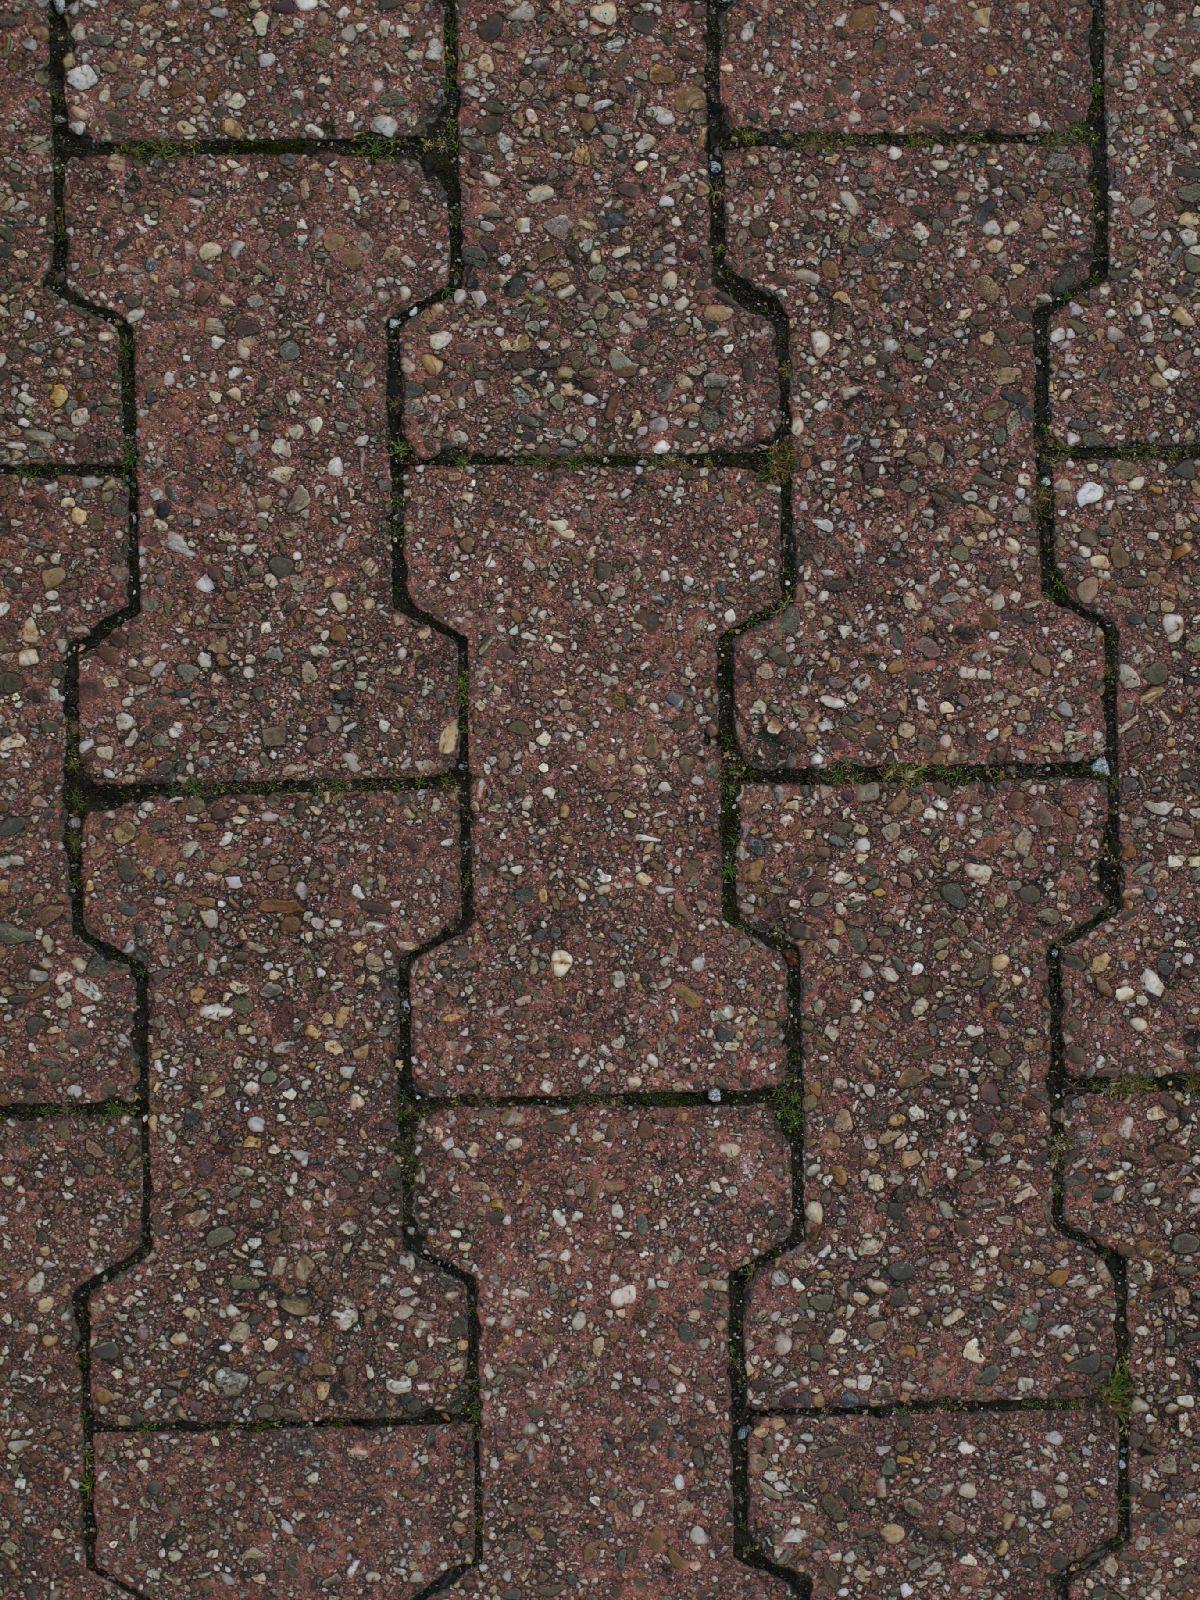 Ground-Urban_Texture_A_PA045721